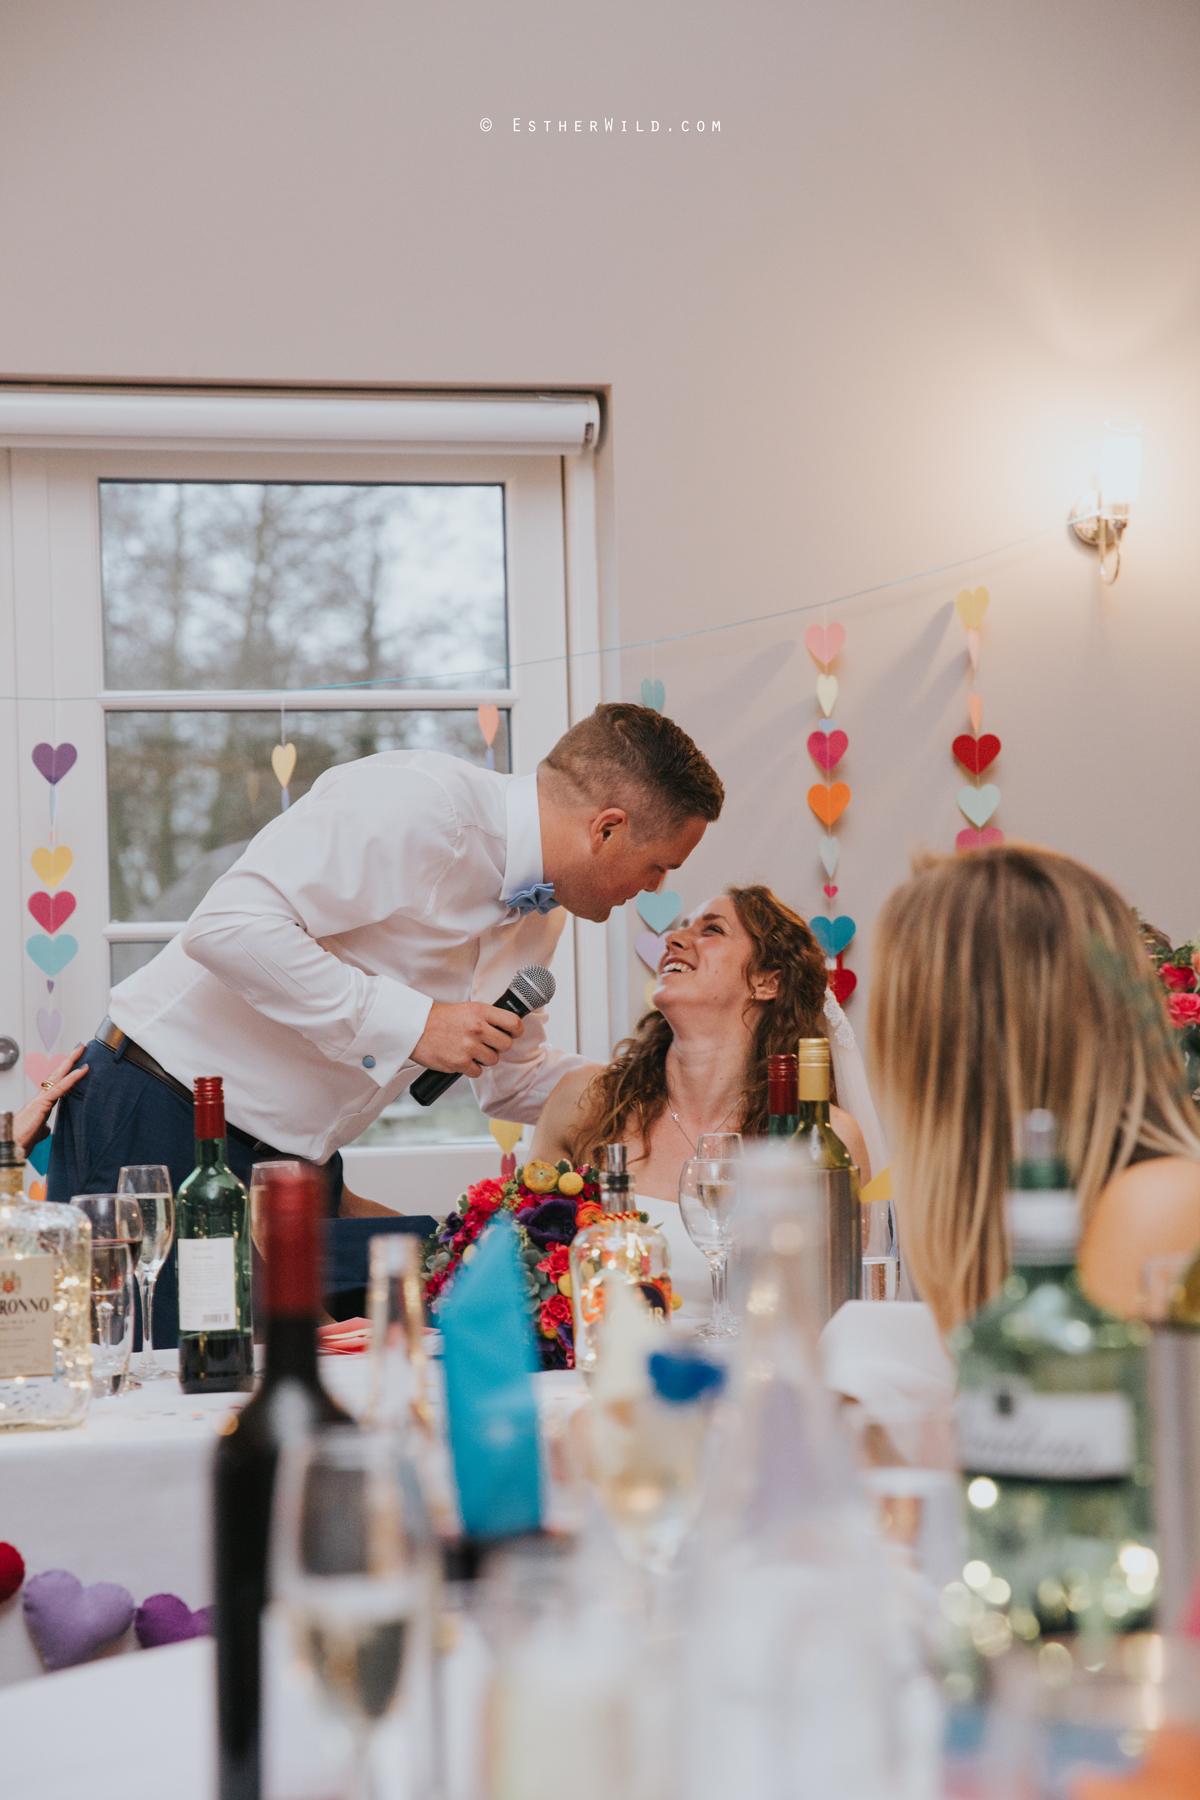 The_BoatHouse_Wedding_Venue_Ormesby_Norfolk_Broads_Boat_Wedding_Photography_Esther_Wild_Photographer_IMG_3163.jpg